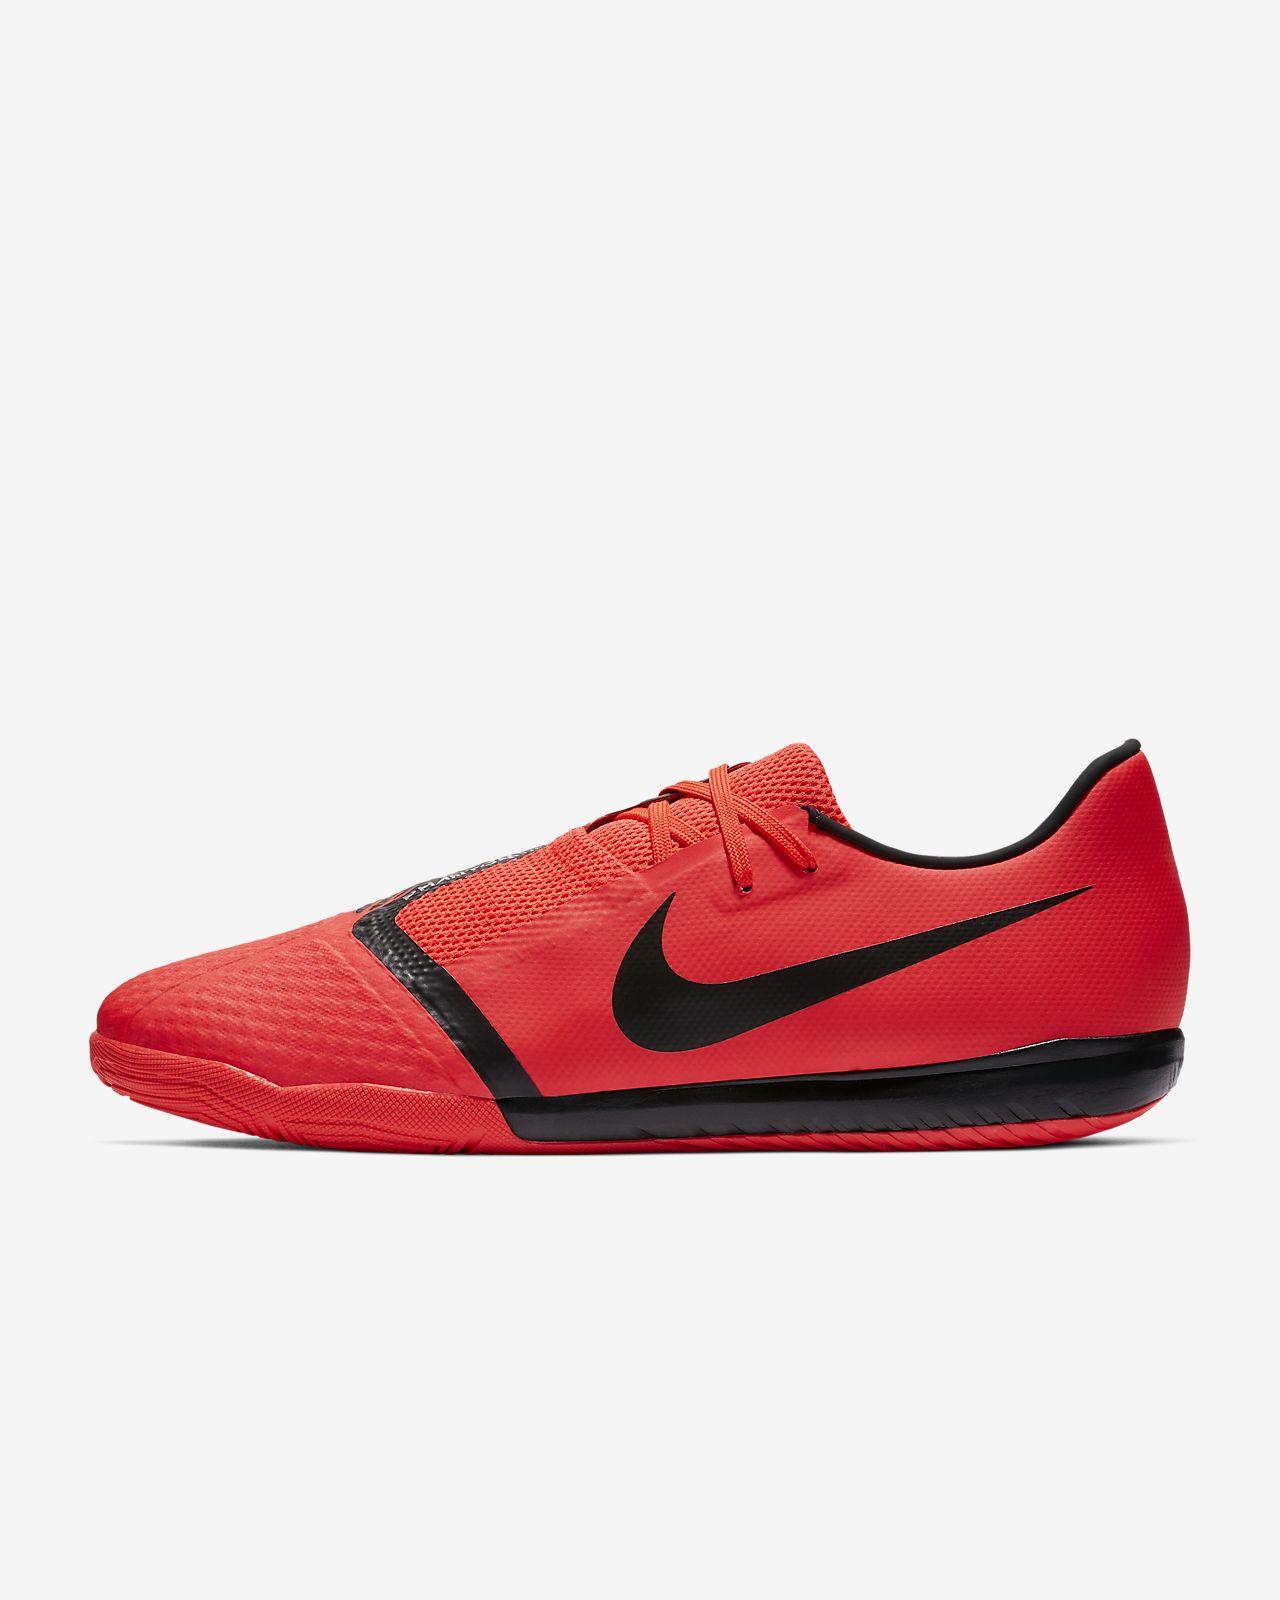 Nike PhantomVNM Academy IC Game Over Indoor/Court Football Boot